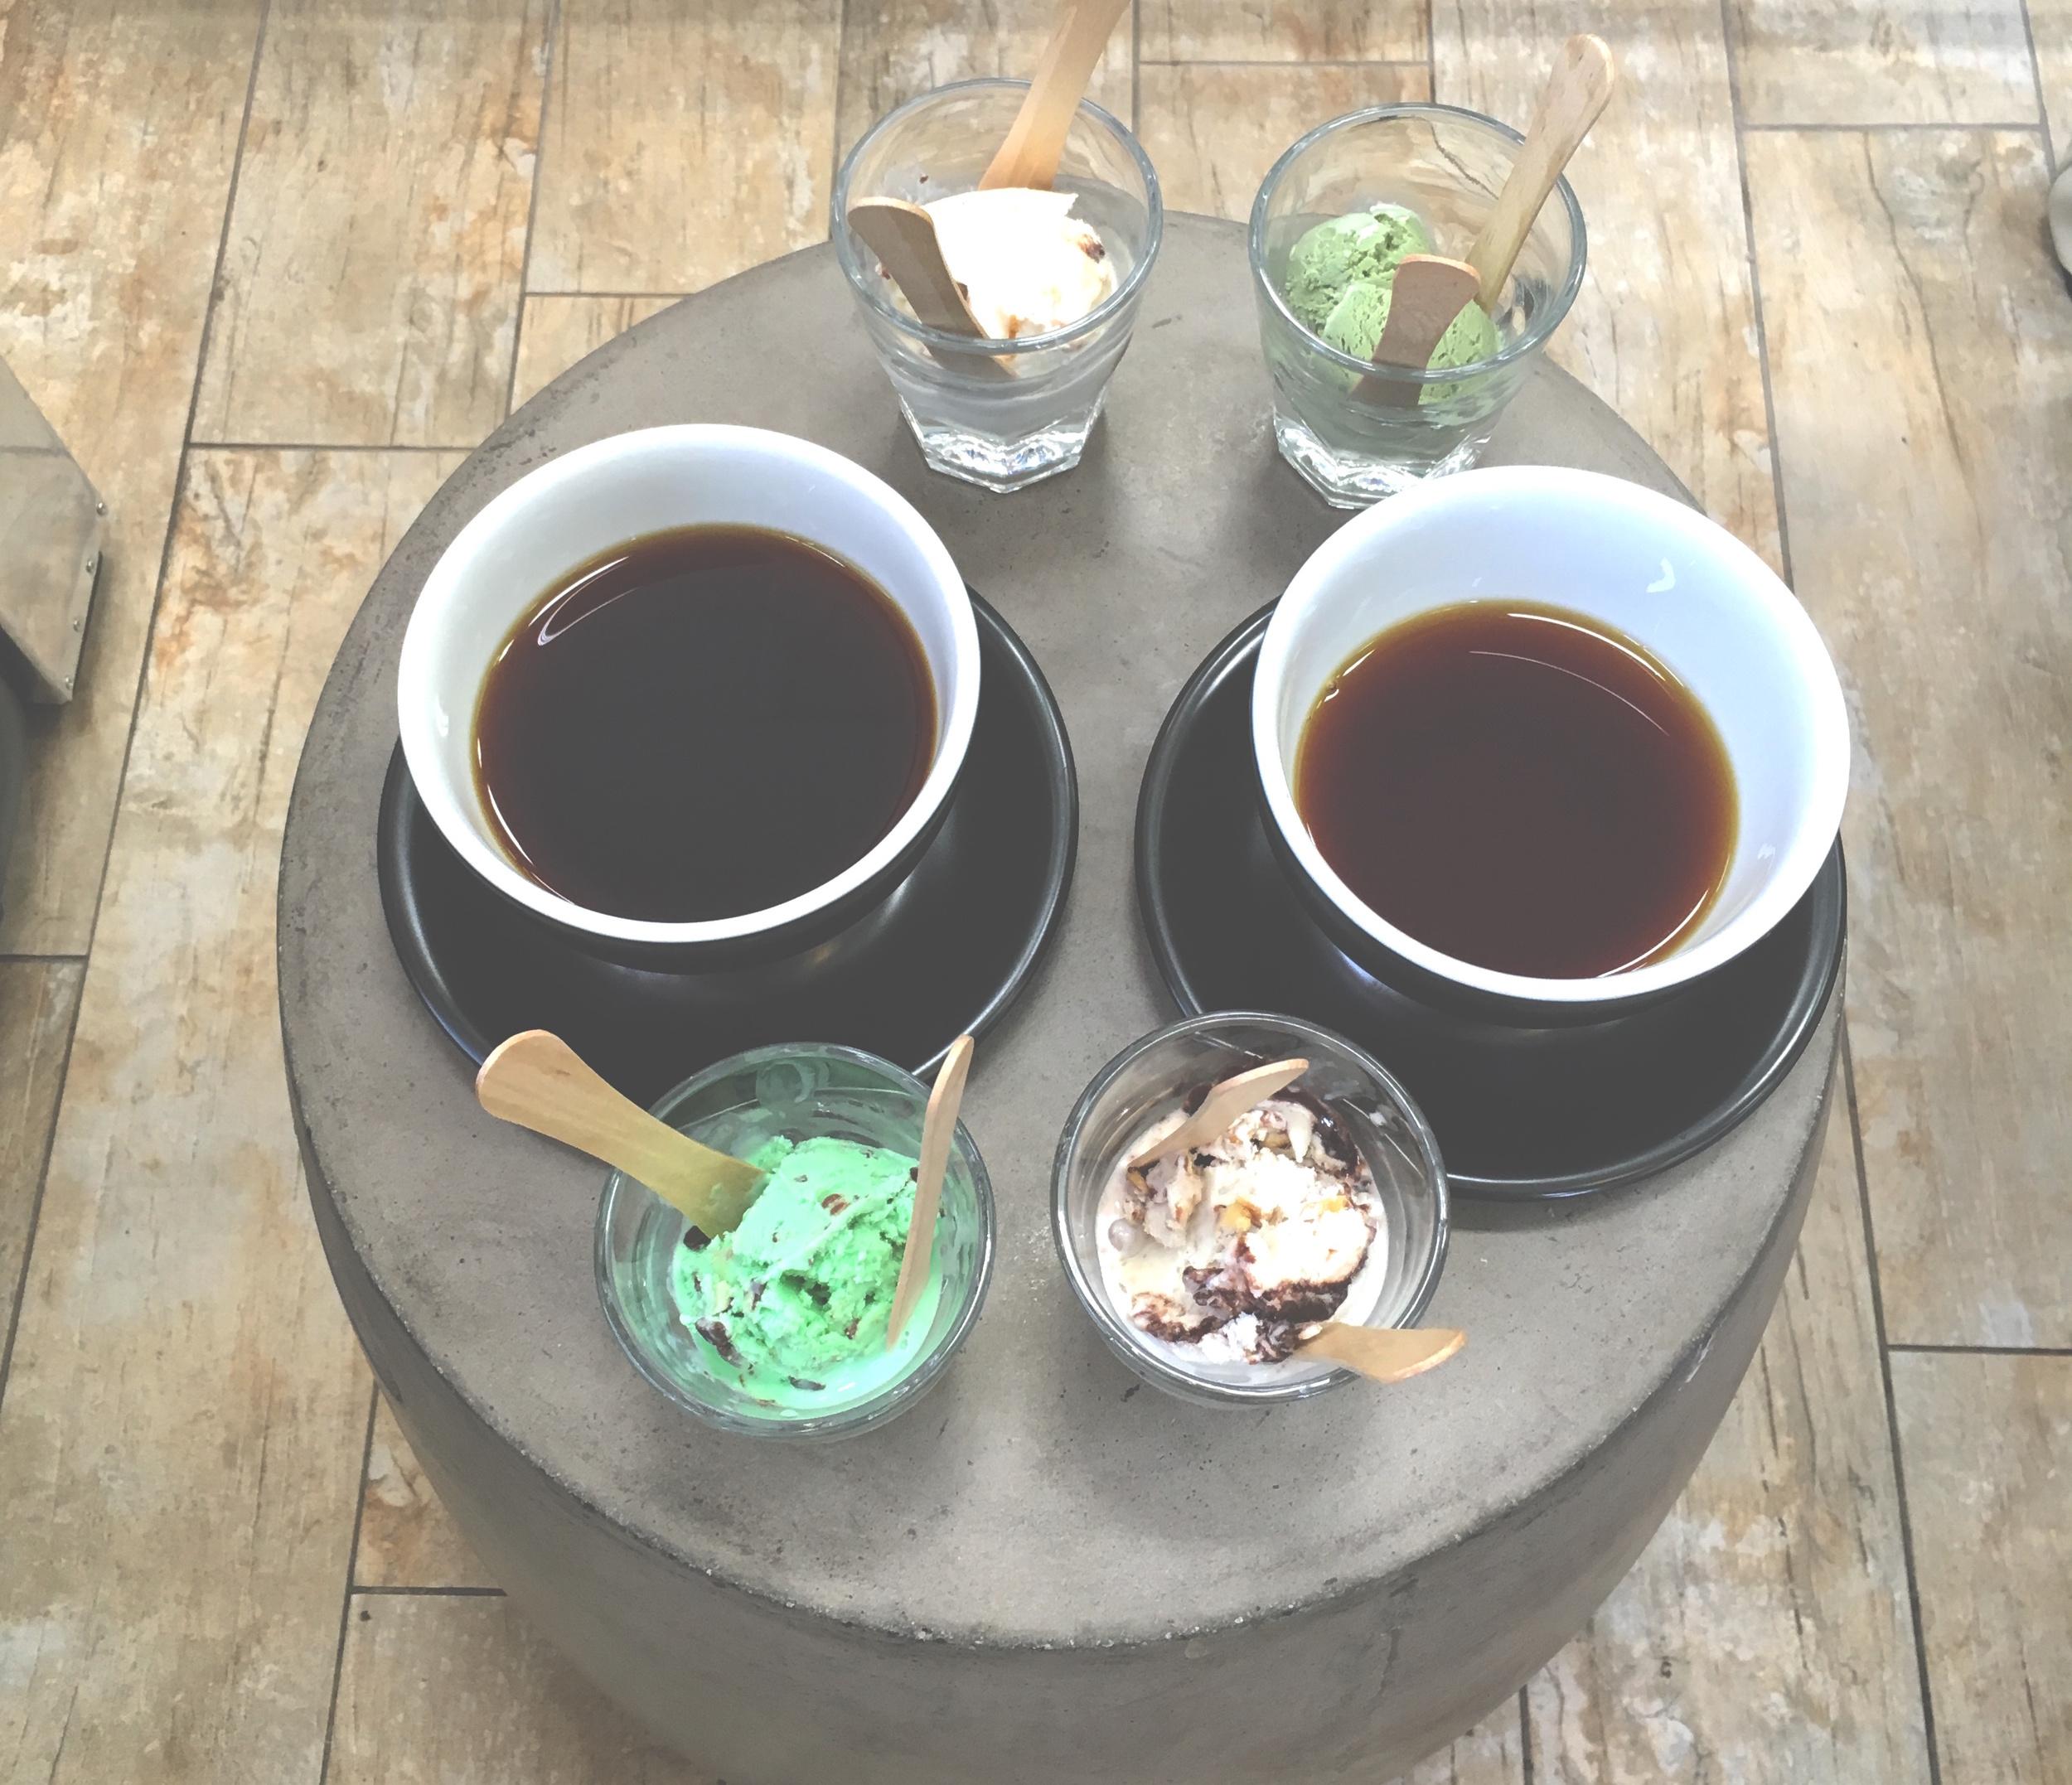 Chromatic Coffee and Mitchell's Ice Cream Tasting Flight